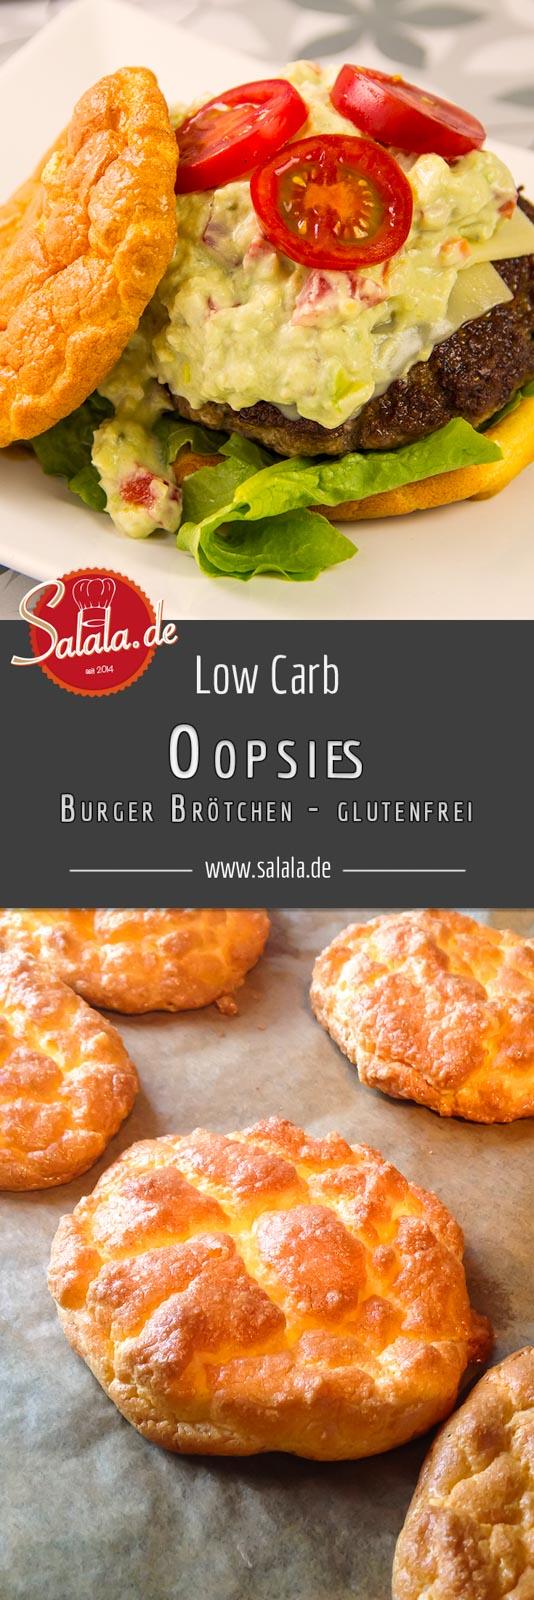 Oopsies sind der Low Carb Klassiker unter den Low Carb Brötchen. Du kannst Sie als Burger Brötchen oder als Low Carb Brotersatz backen. Die Low Carb Burger Brötchen haben nur 1 g Kohlenhydrate pro Stück!